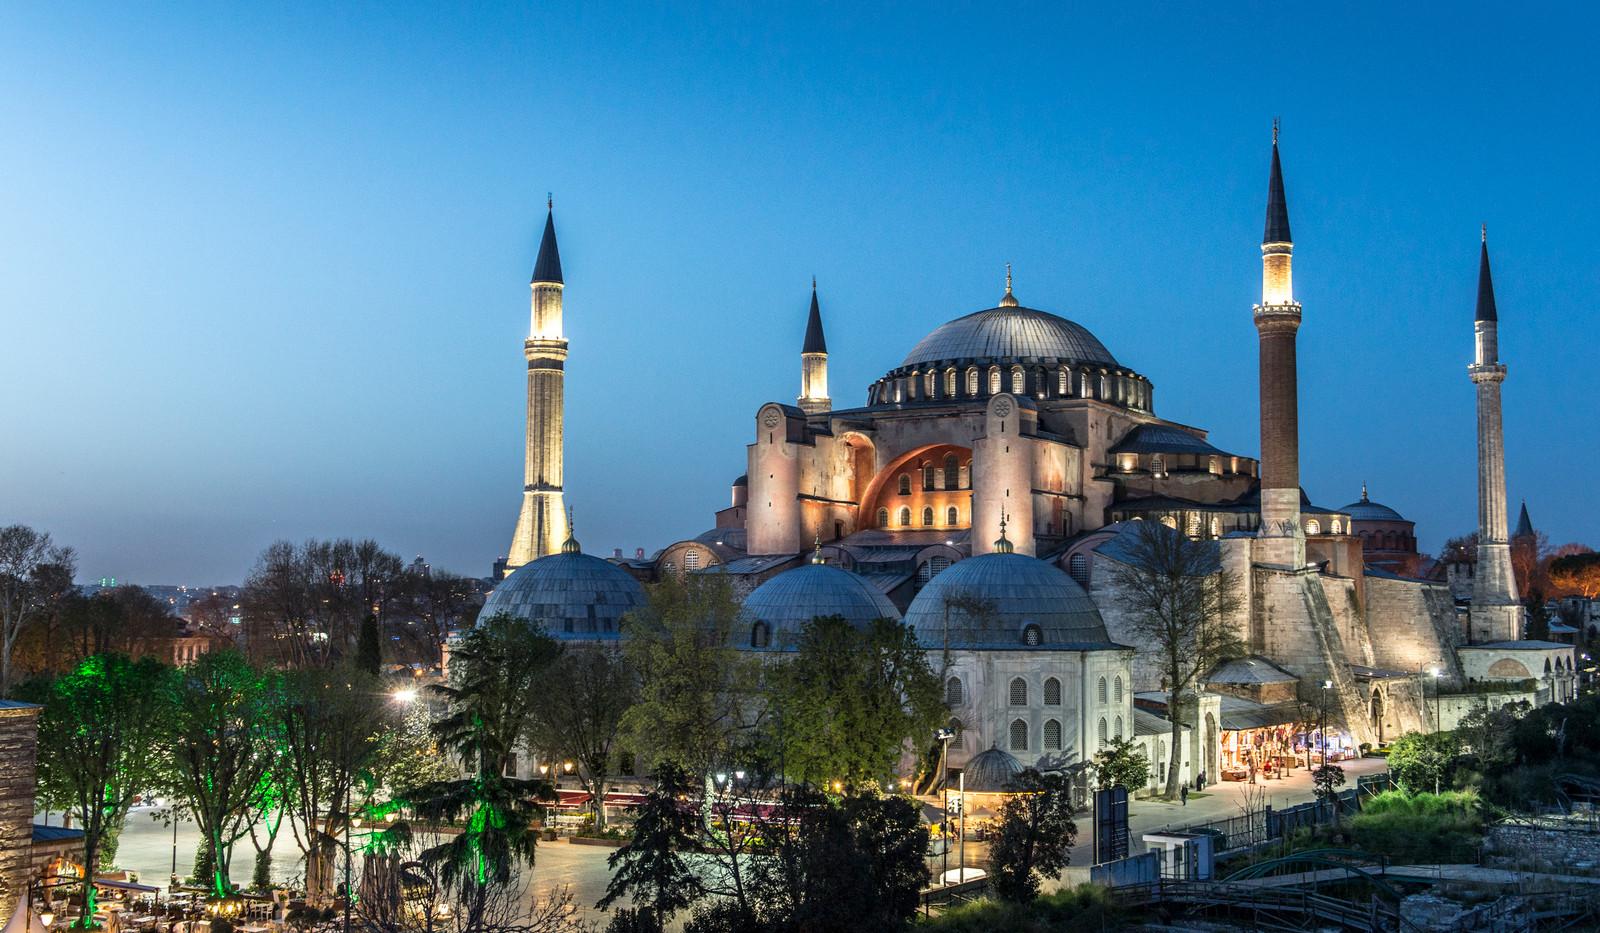 Canva - Hagia Sophia in Istanbul, Turkey